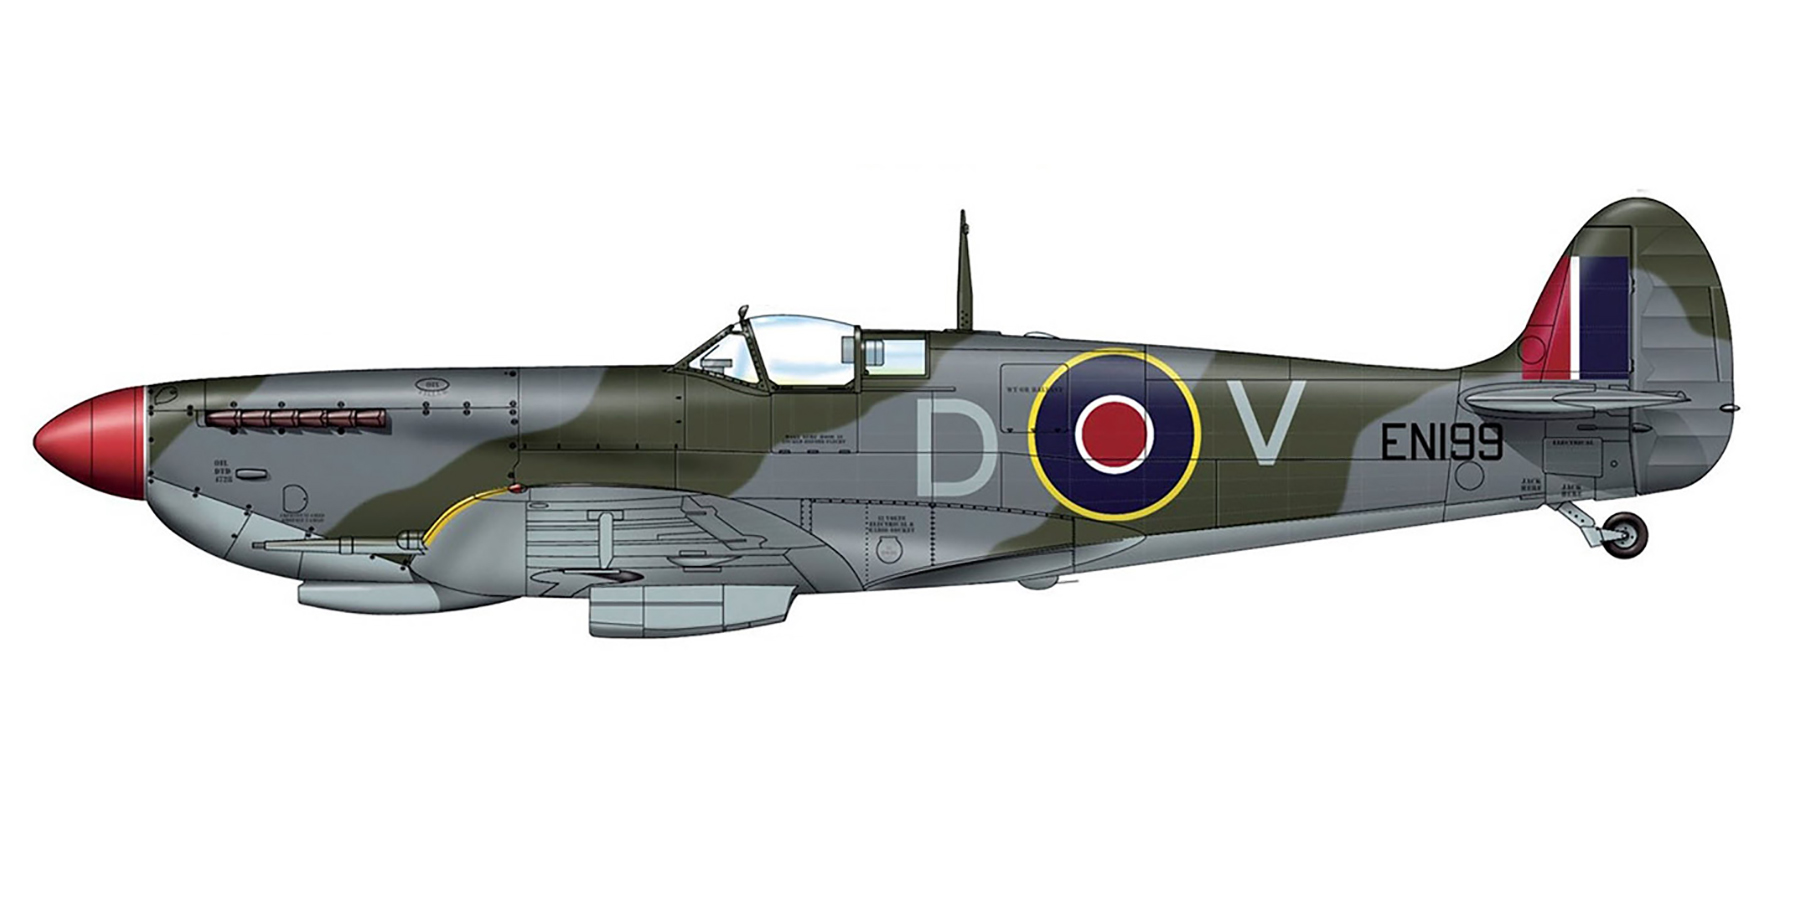 Spitfire MkIX RAF 1435Sqn DV EN199 Brindisi Italy 1943 0A